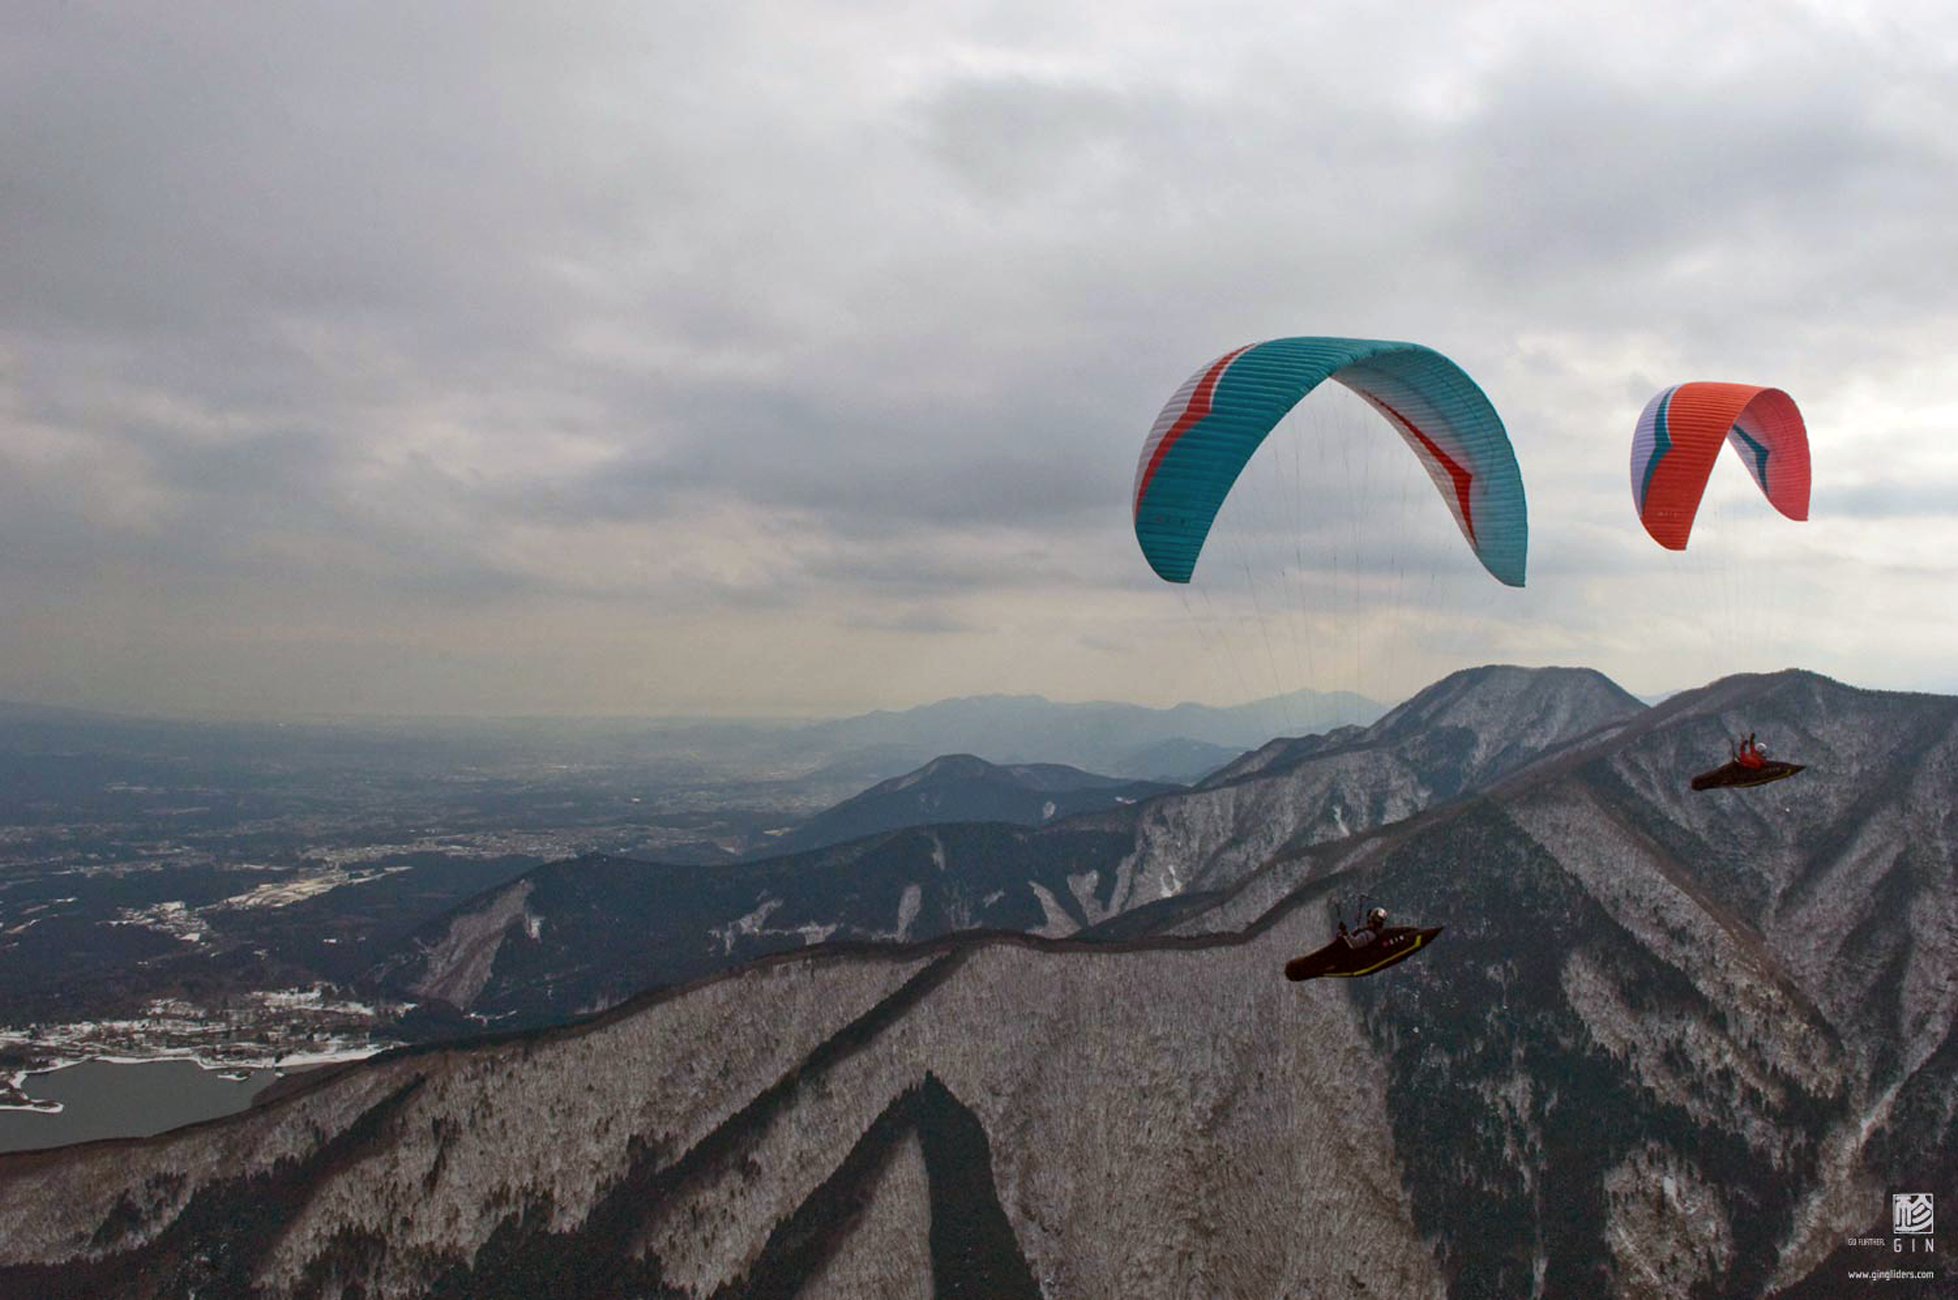 Designapplause Boomerang 8 Paraglider Gin Gliders